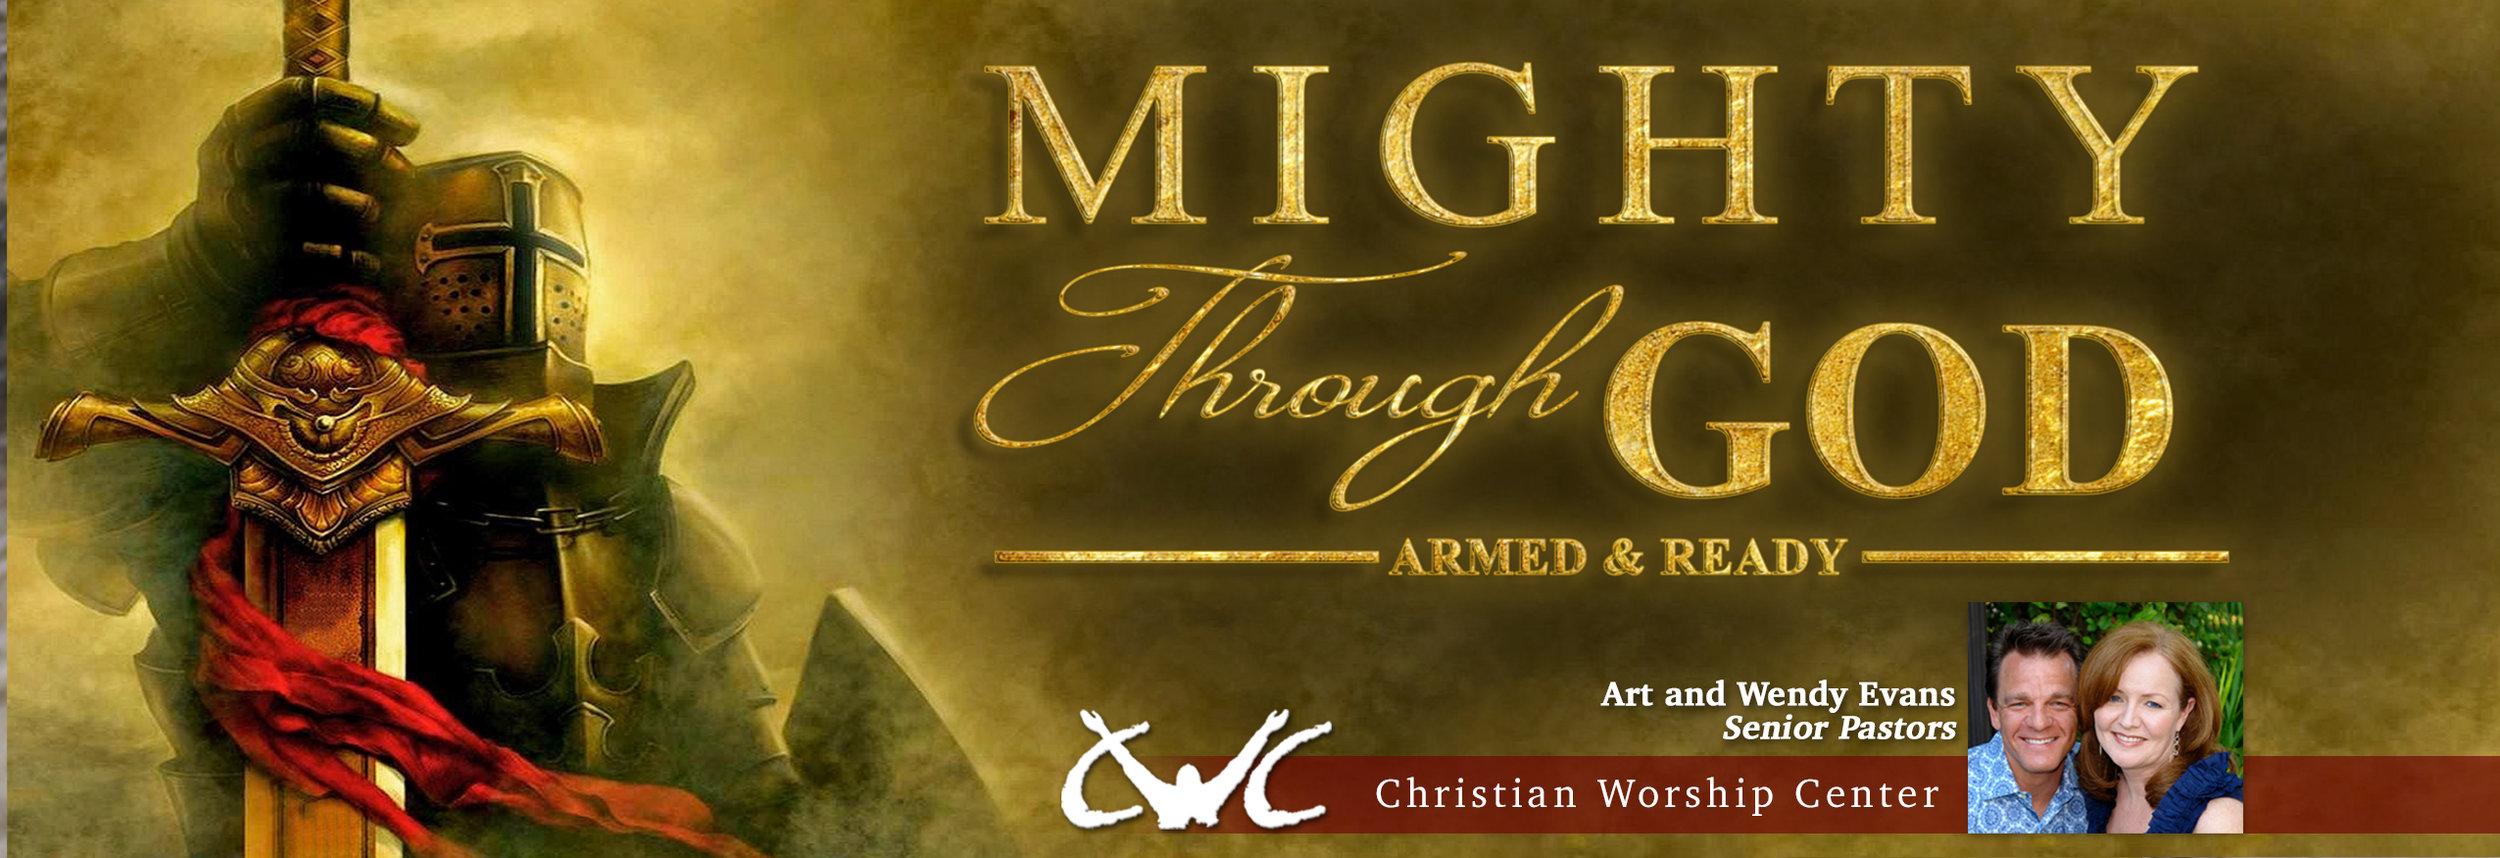 Mighty Through God Facebook and Blog Banner3.jpg